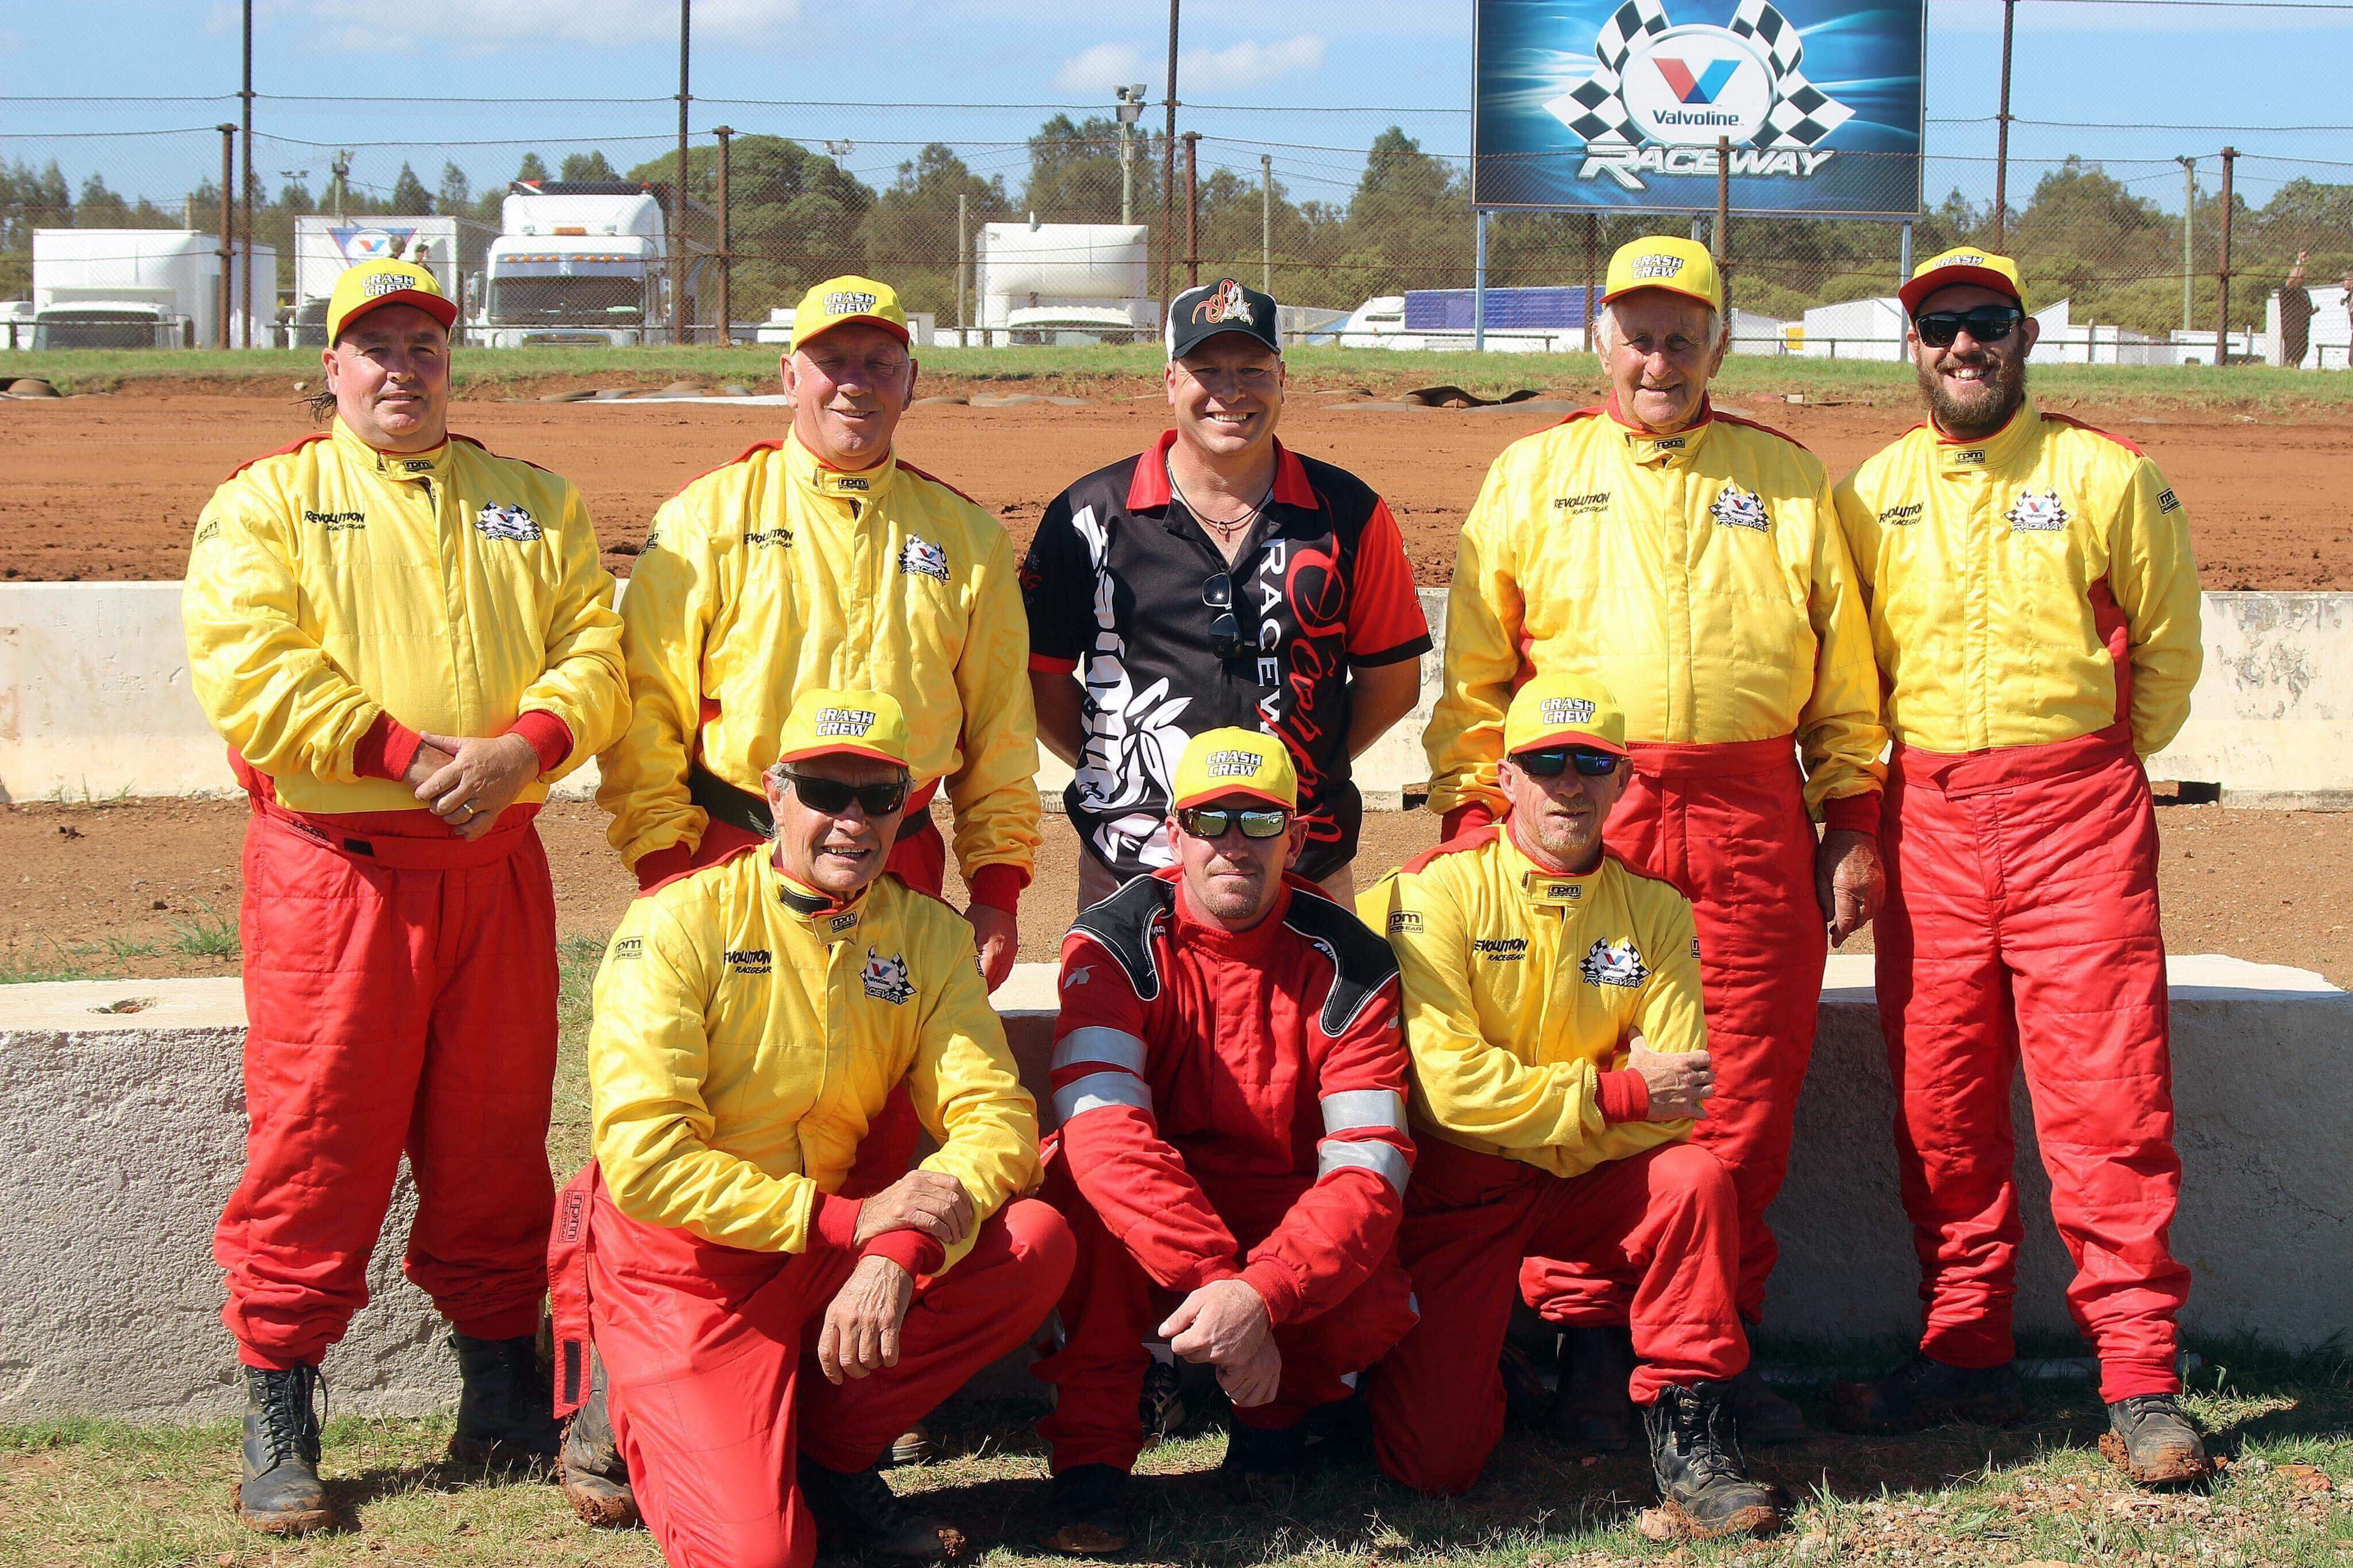 Valvoline Raceway Crash Crew